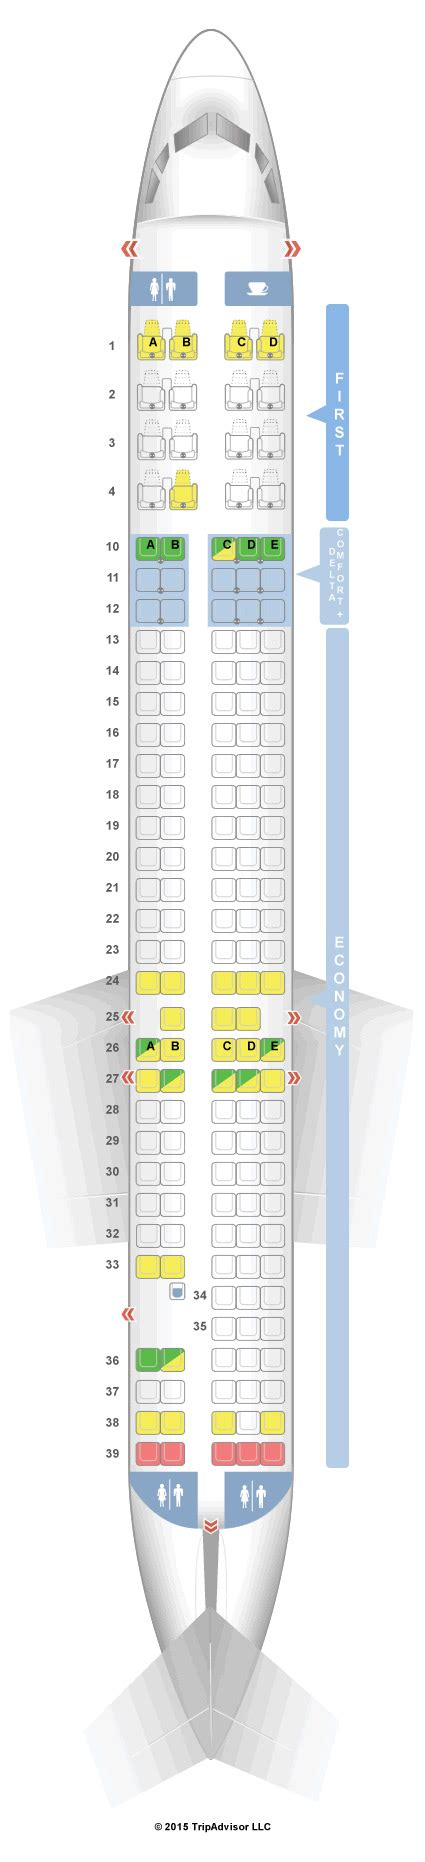 md 90 seating chart seatguru seat map delta mcdonnell douglas md 90 seatguru